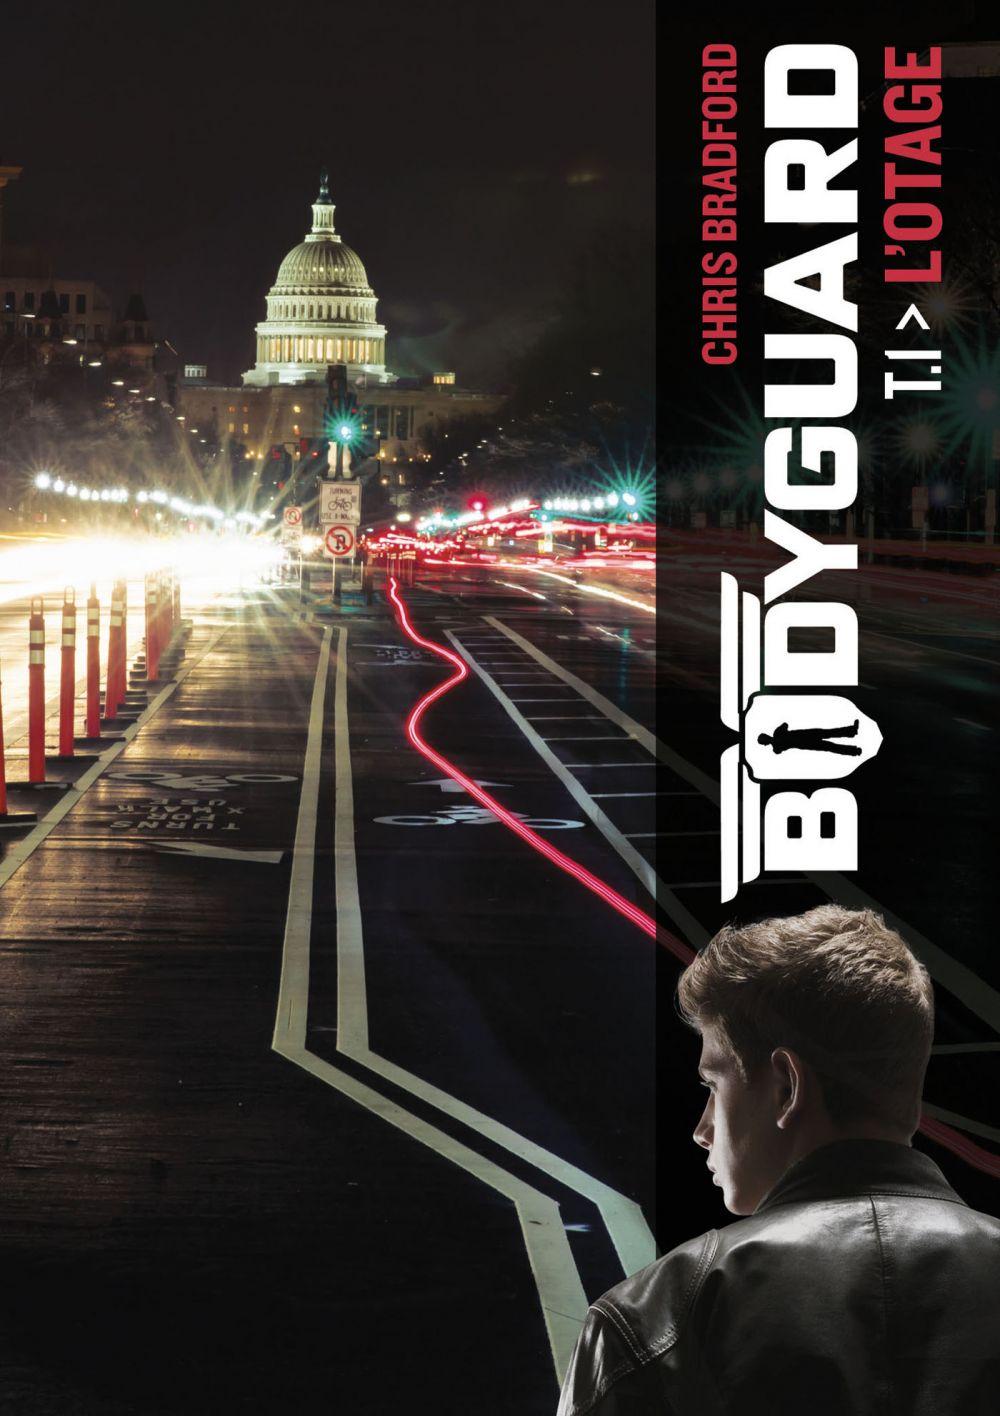 Bodyguard (Tome 1) - L'otage |